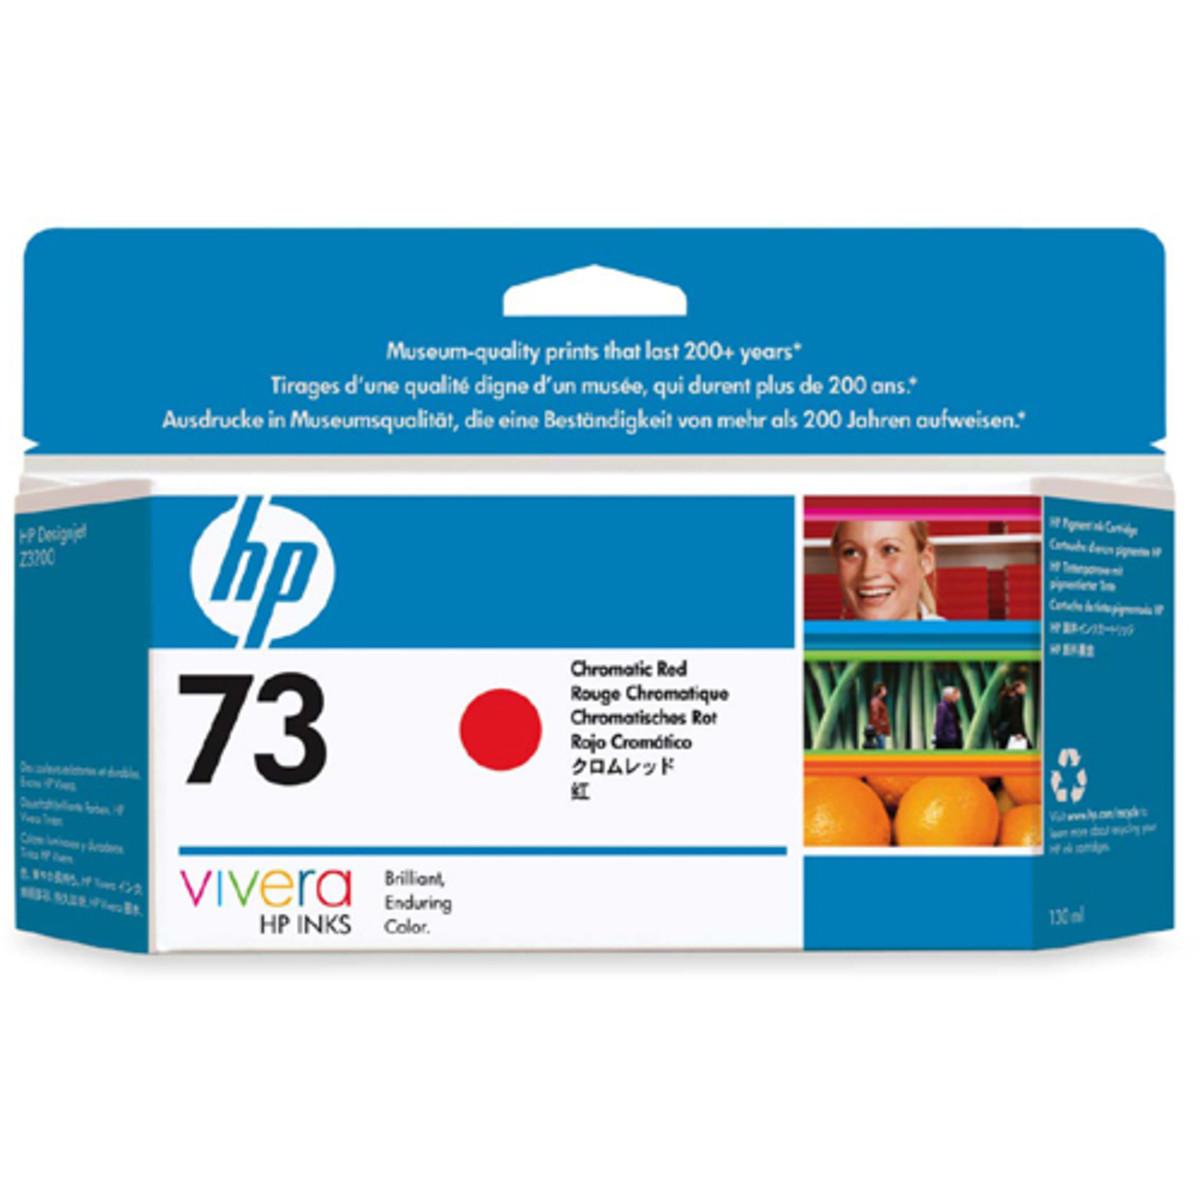 HP 73 (CD951A) Chromatic Red Ink Cartridge